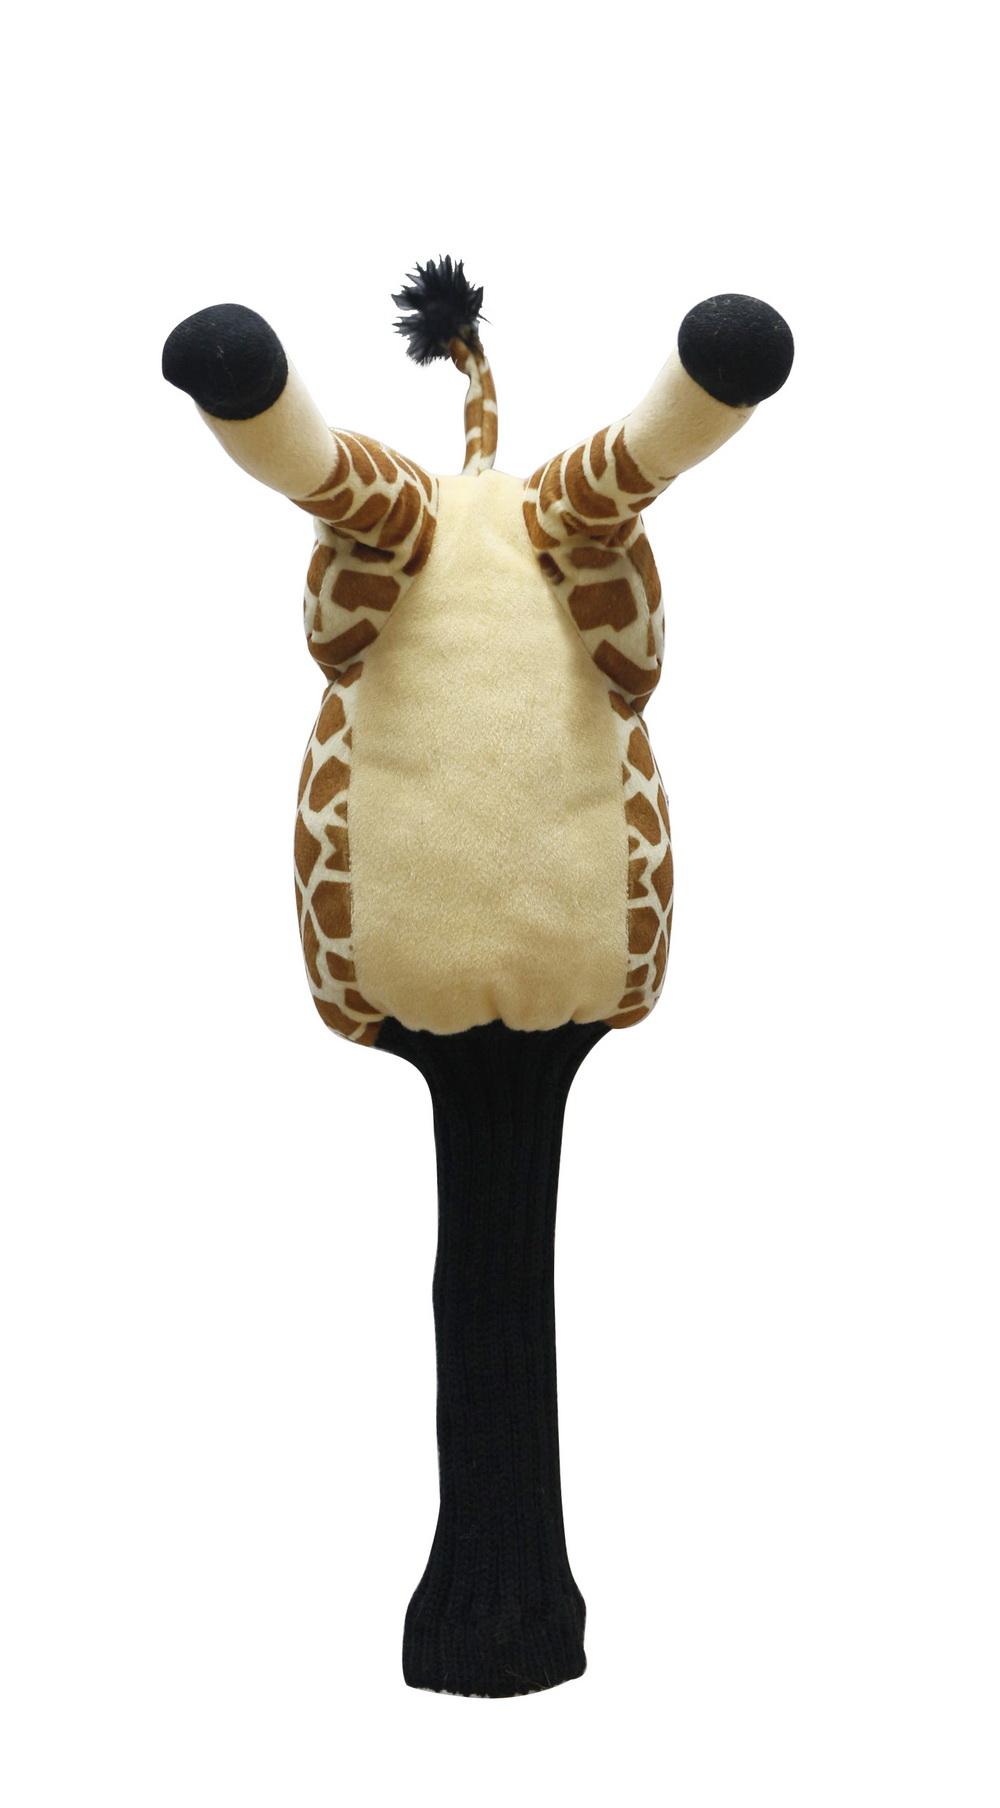 Butthead-Giraffe-Head-Cover_02.jpg